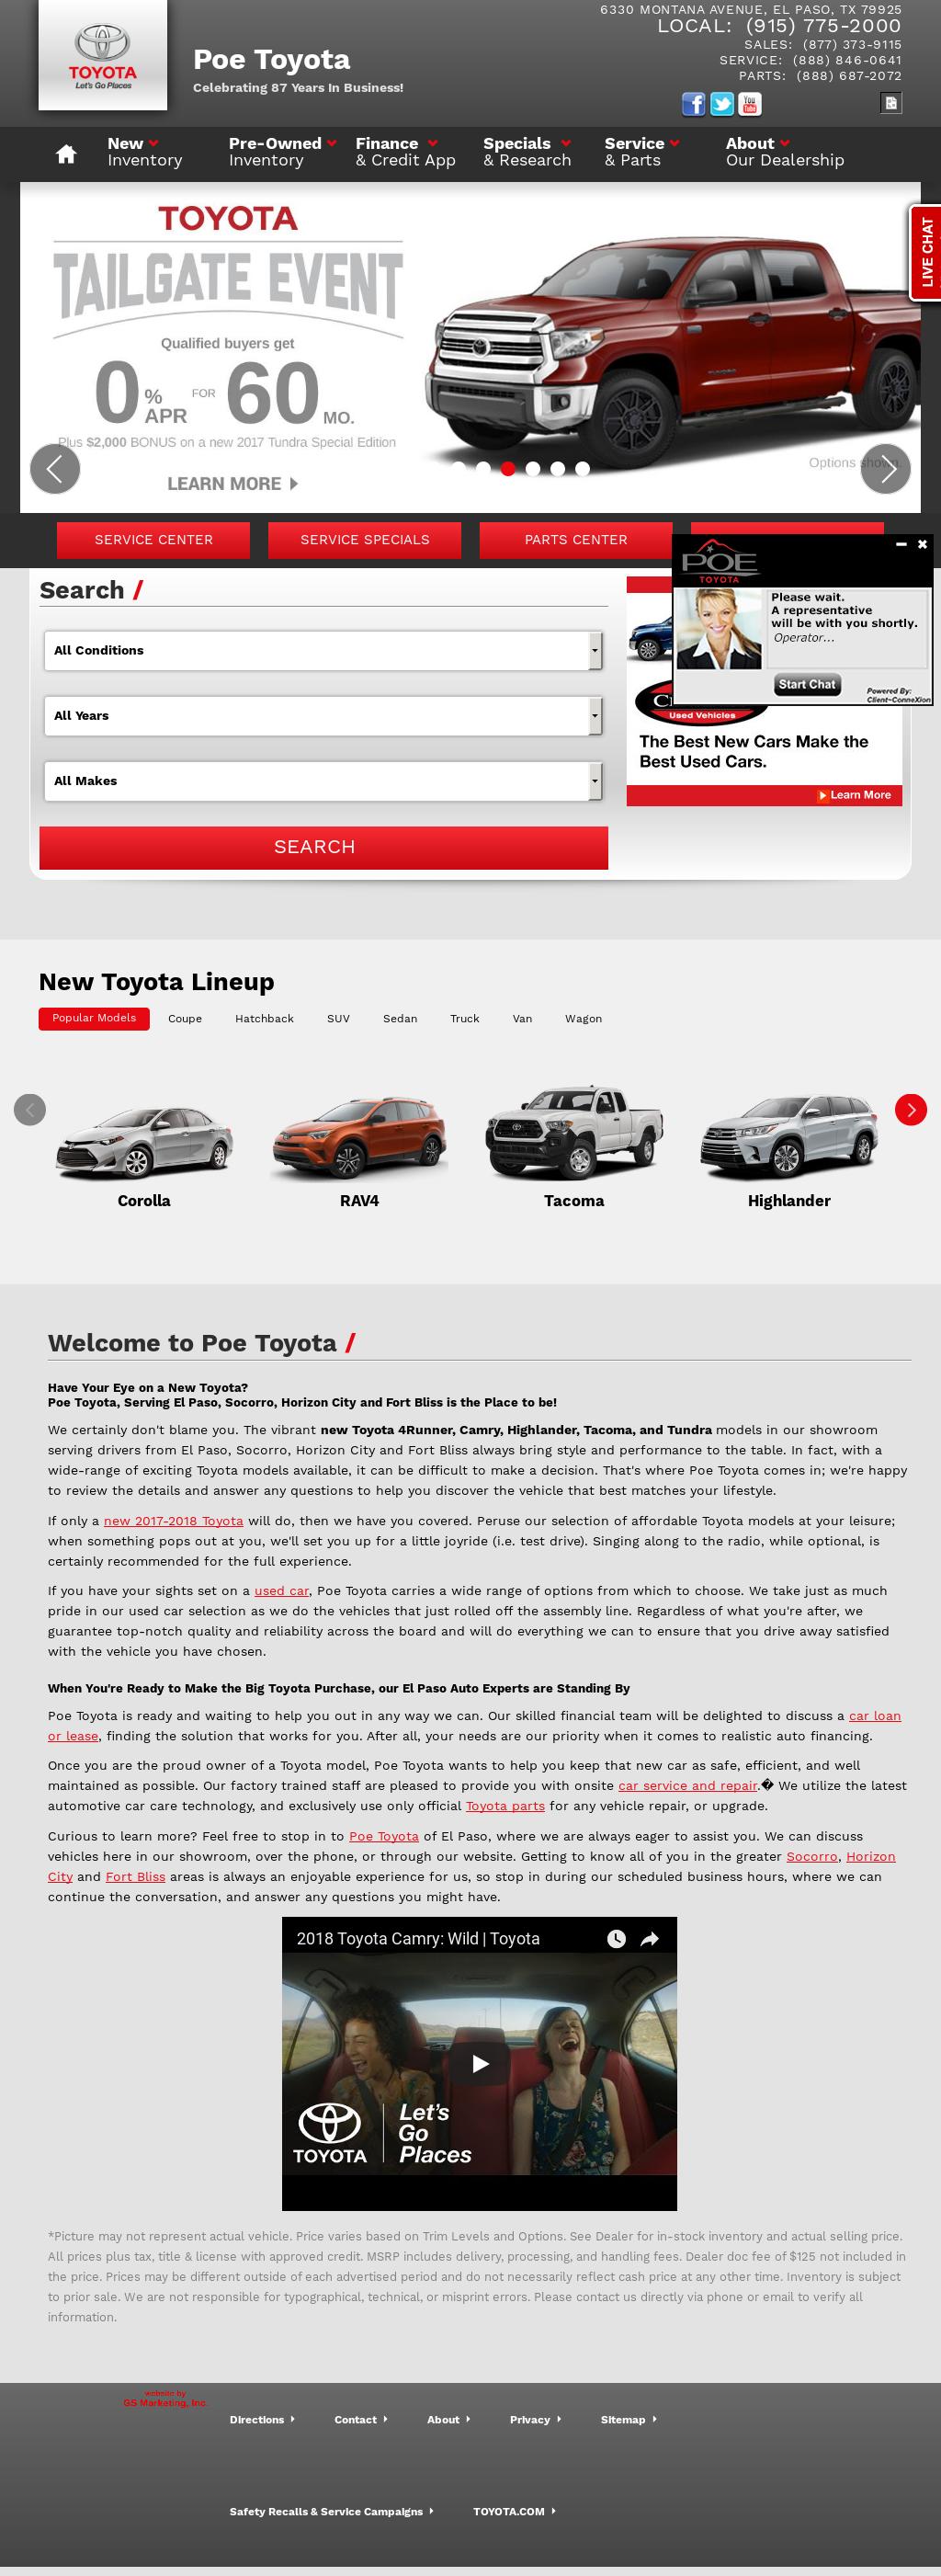 Fox Toyota Of El Paso U003eu003e Toyota El Paso | News Of New Car Release